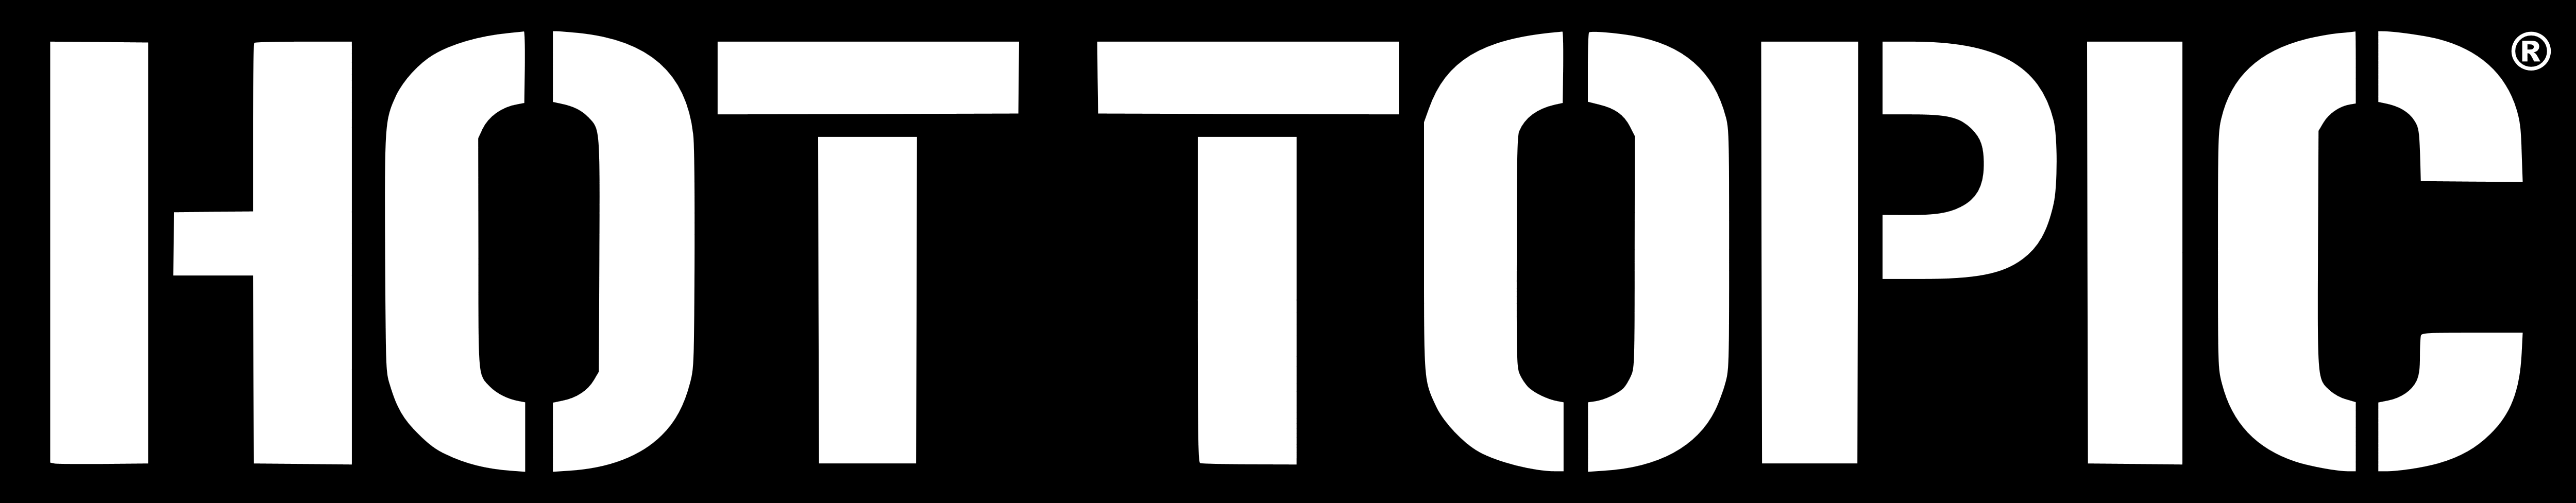 1752 Airbus Group Logo Download besides 9861 Magento Logo Download together with 5238 Forbes Logo Download furthermore 8747 Thule Logo Download likewise 8437 Yokohama Logo Download. on hello world 2016